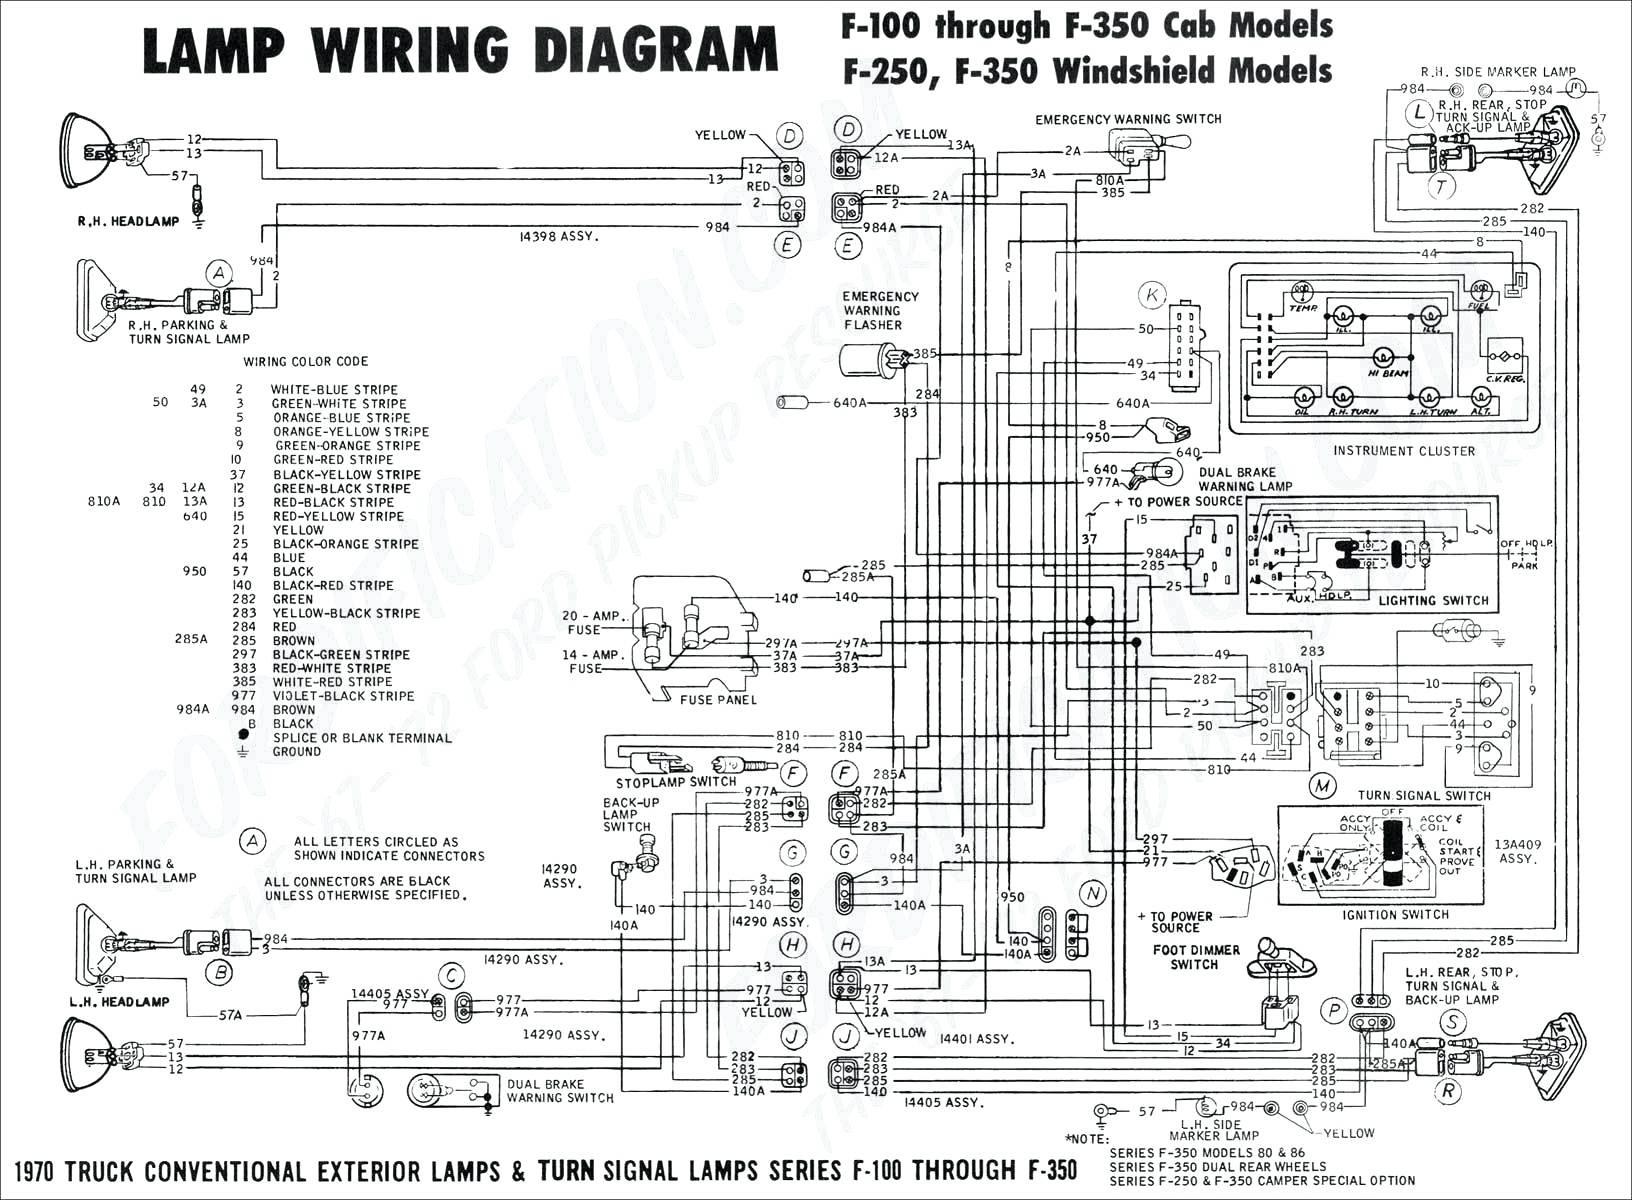 2007 Dodge 1500 Wiring Diagram 2003 Ram 2500 Wiring Diagram Hecho Diagram Base Website Of 2007 Dodge 1500 Wiring Diagram